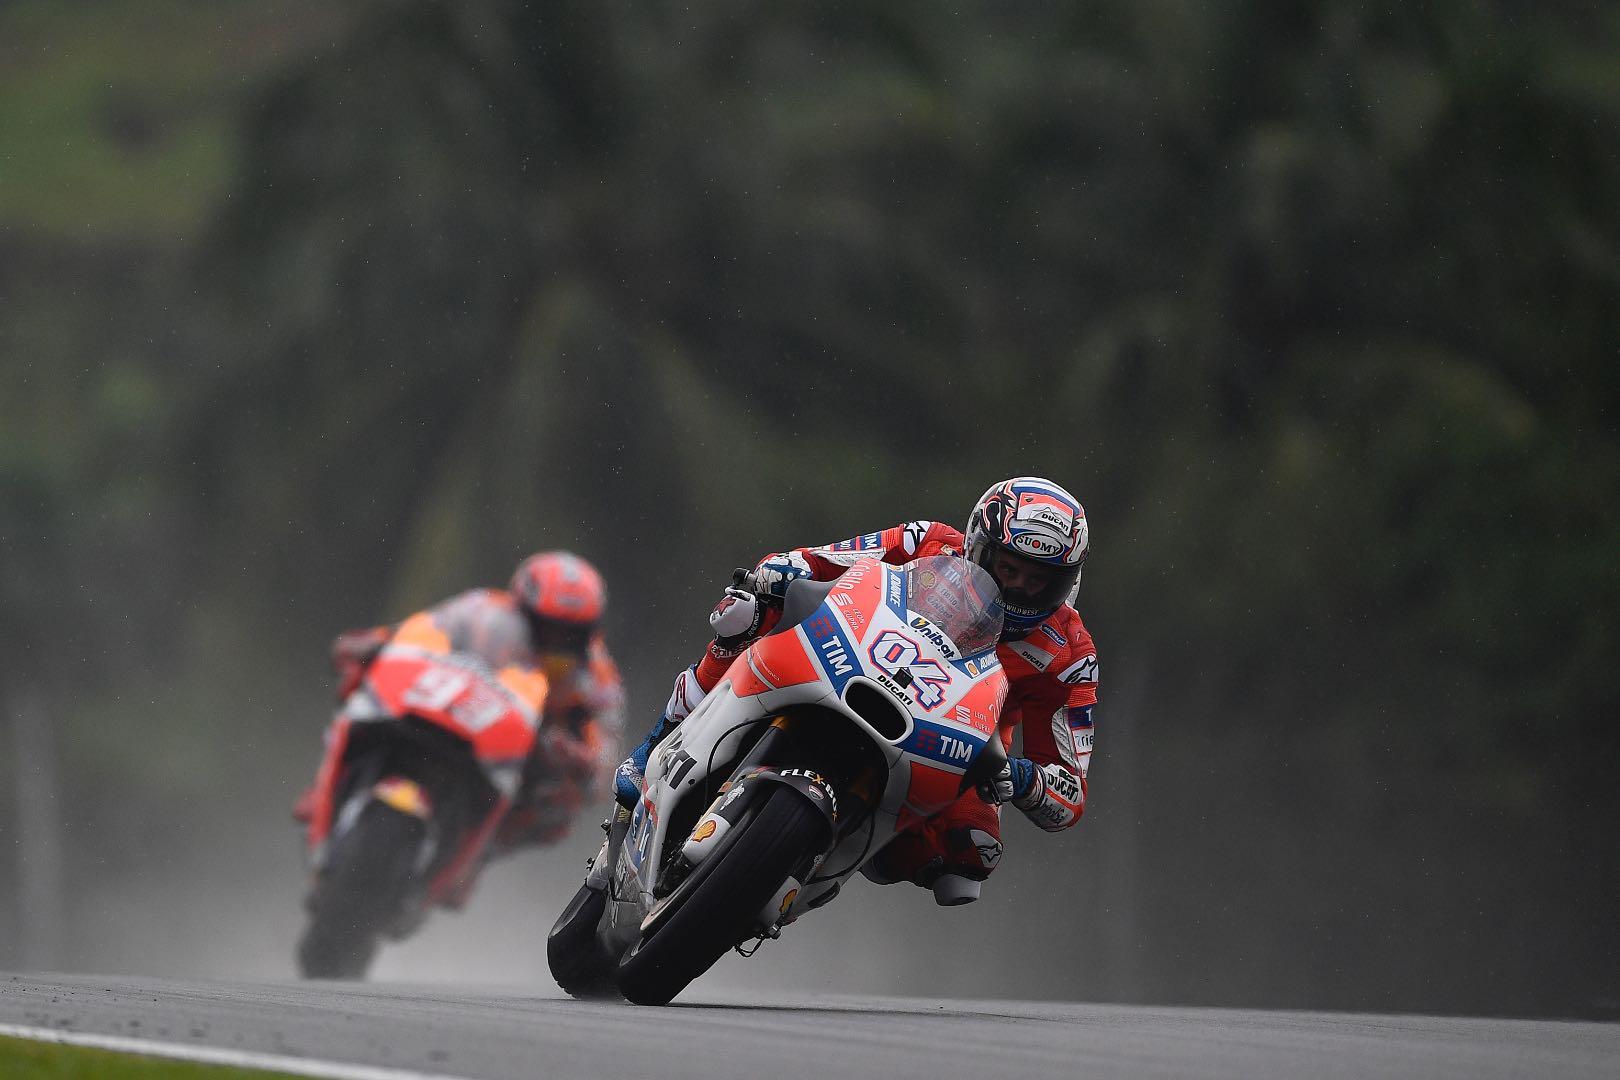 2017 Sepang MotoGP Results: Ducati's Dovizioso